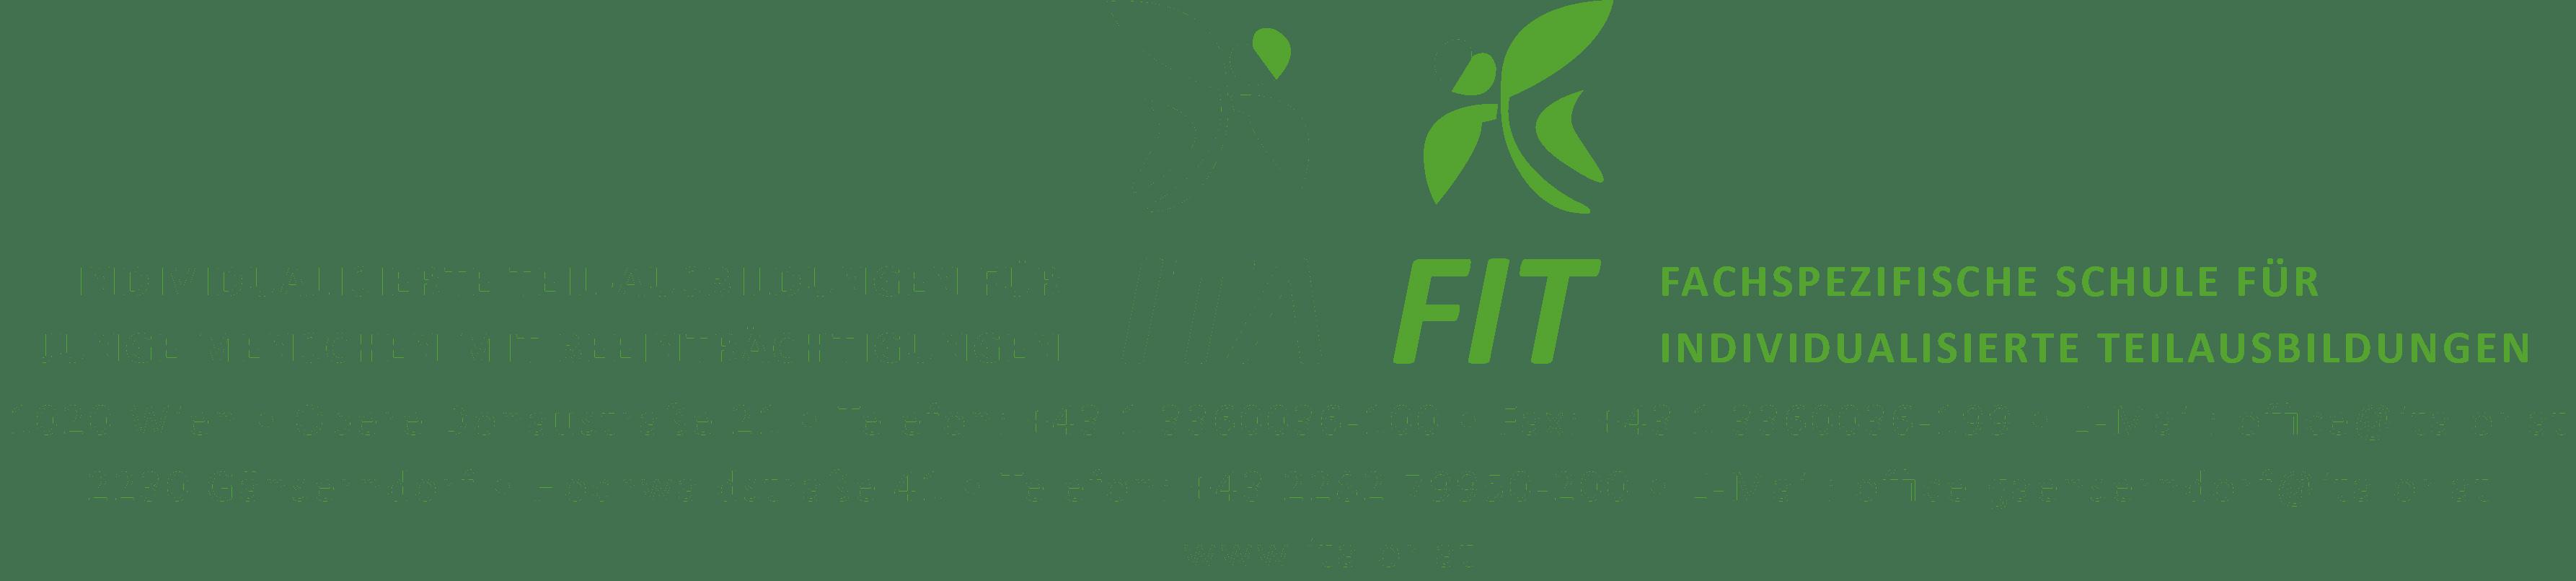 ITA FIT Logo gross 5 2018 03 11 png